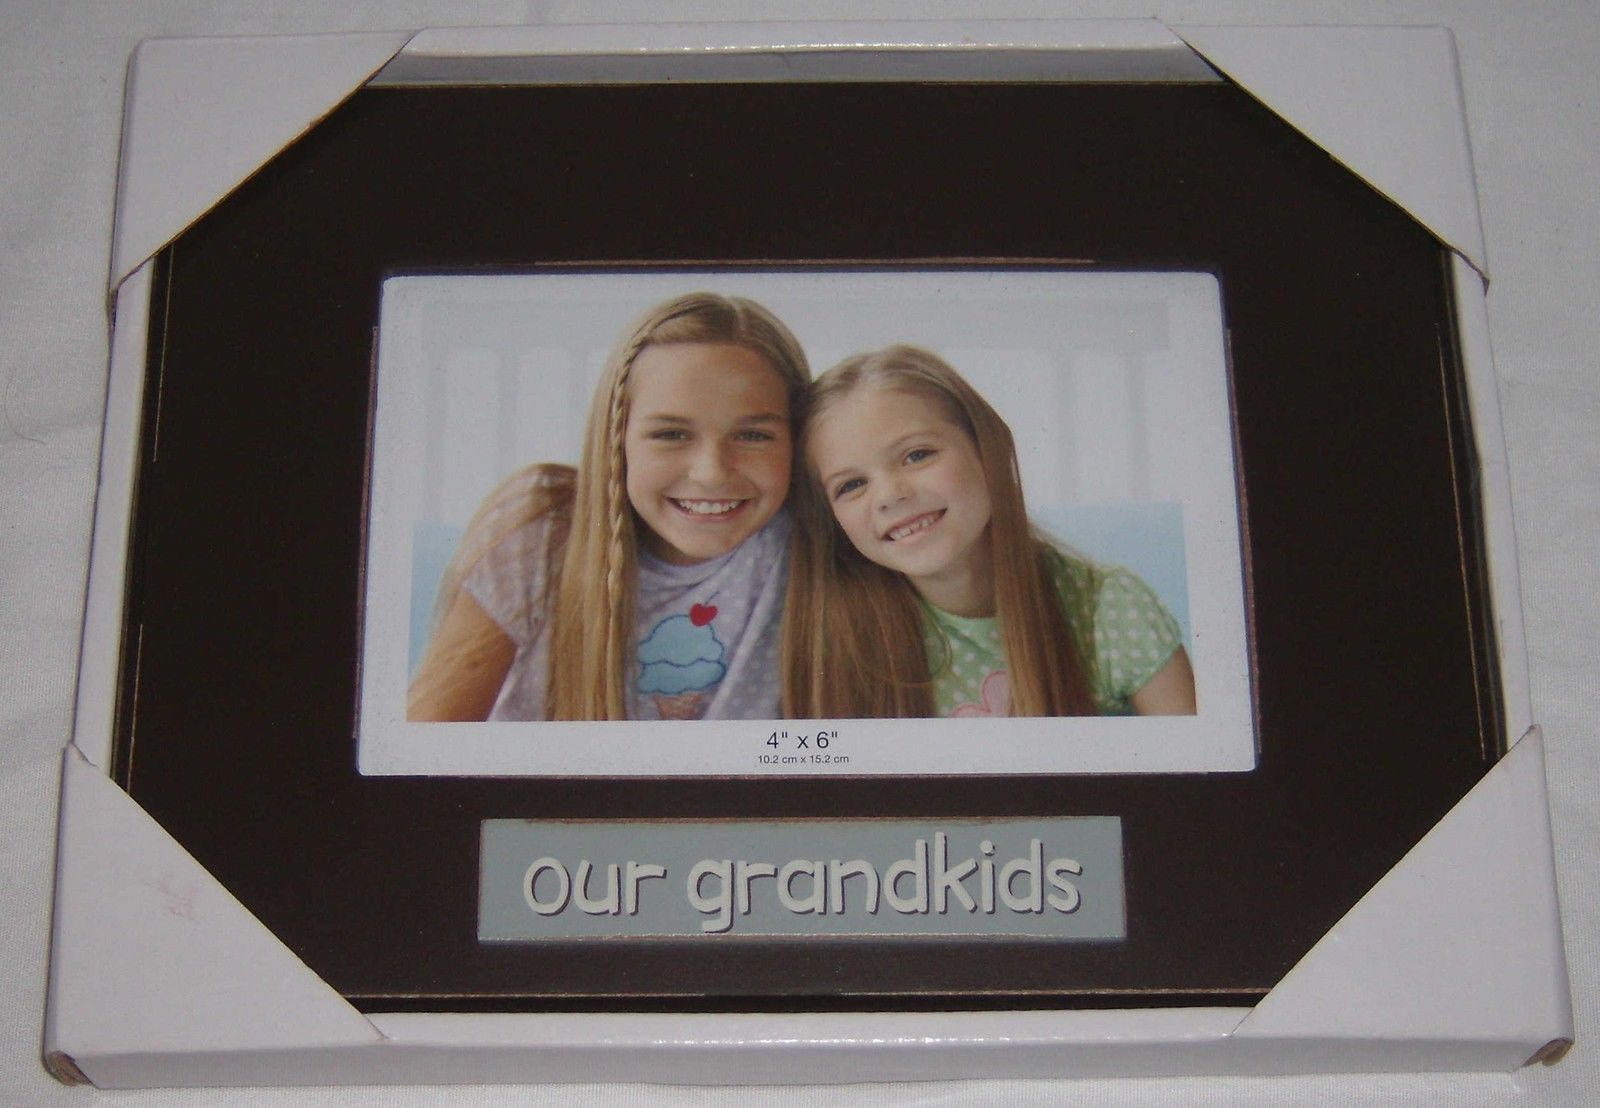 Kohls Photo Frame: 2 listings